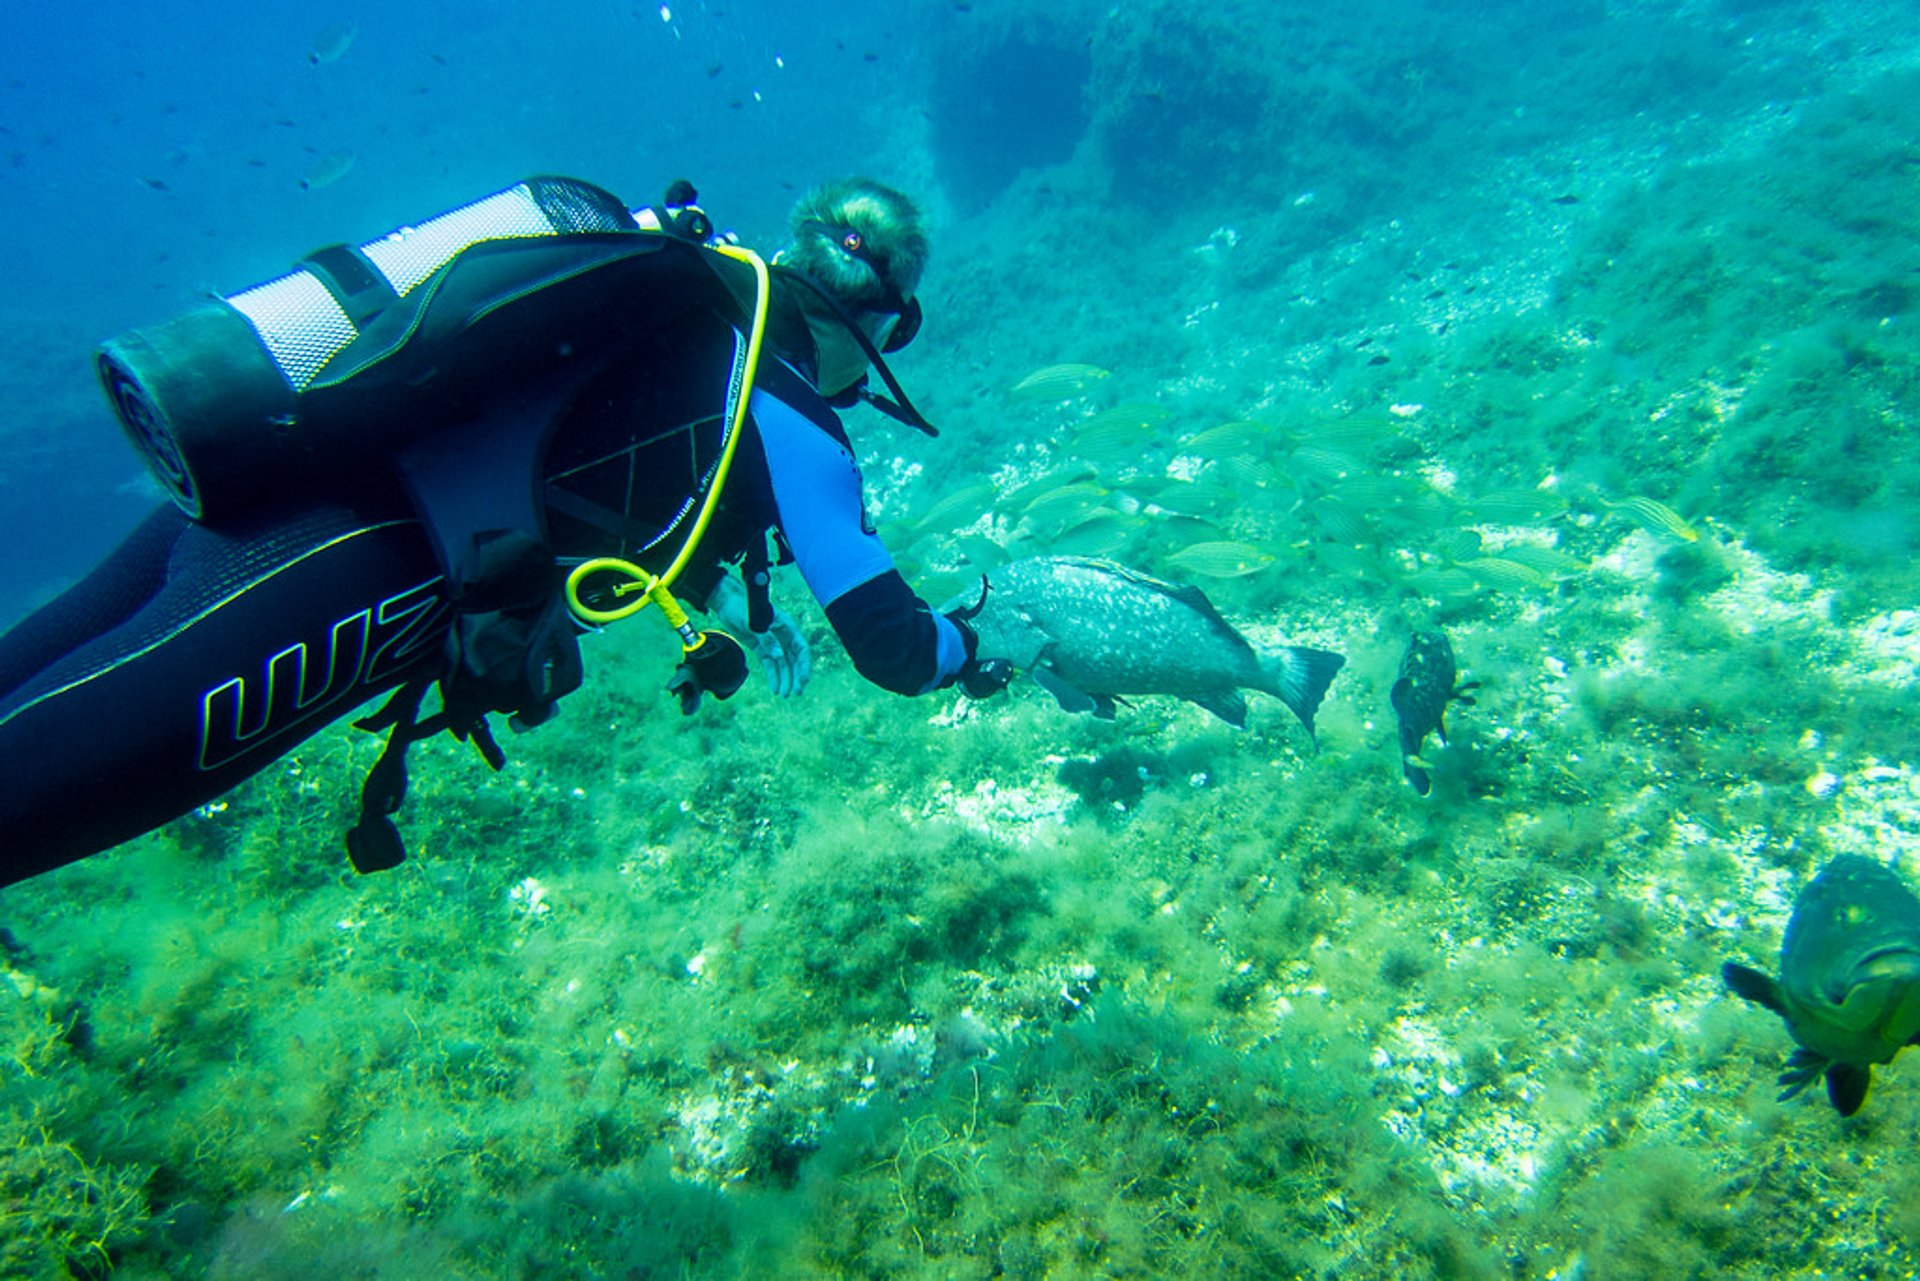 Scuba Diving in Mallorca in Mallorca 2020 - Best Time